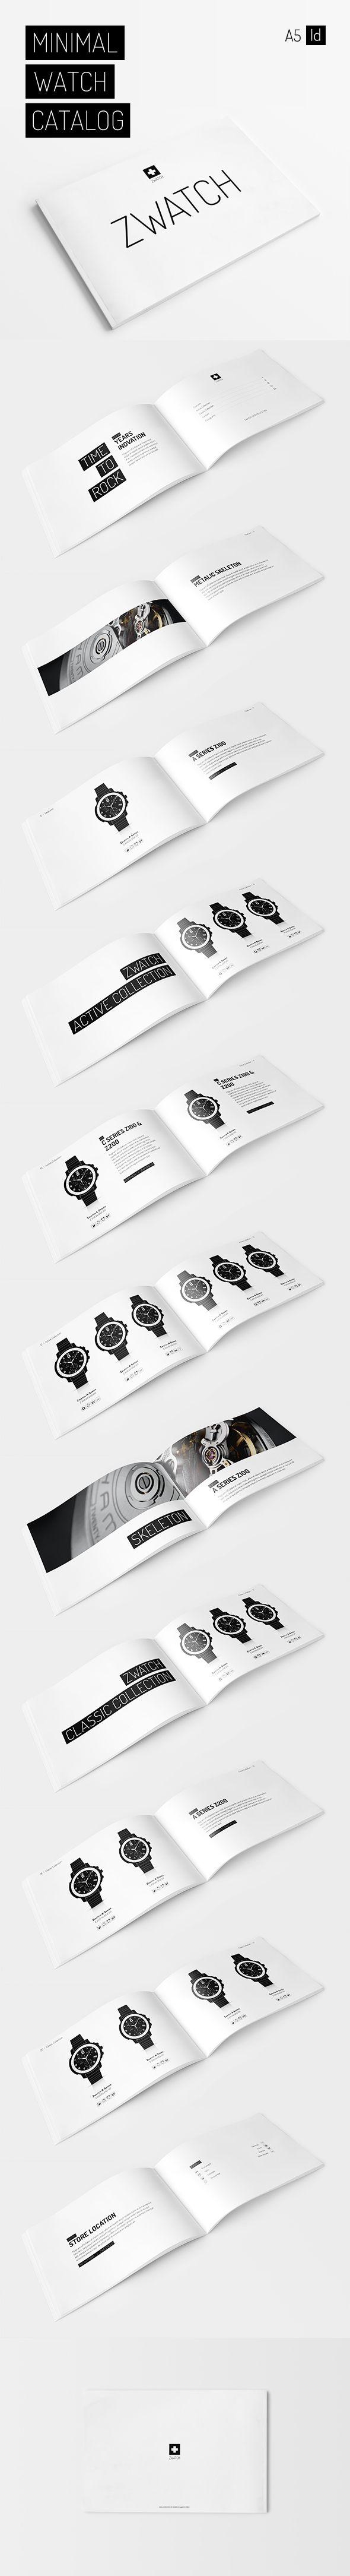 Minimal Watch Catalog on Behance